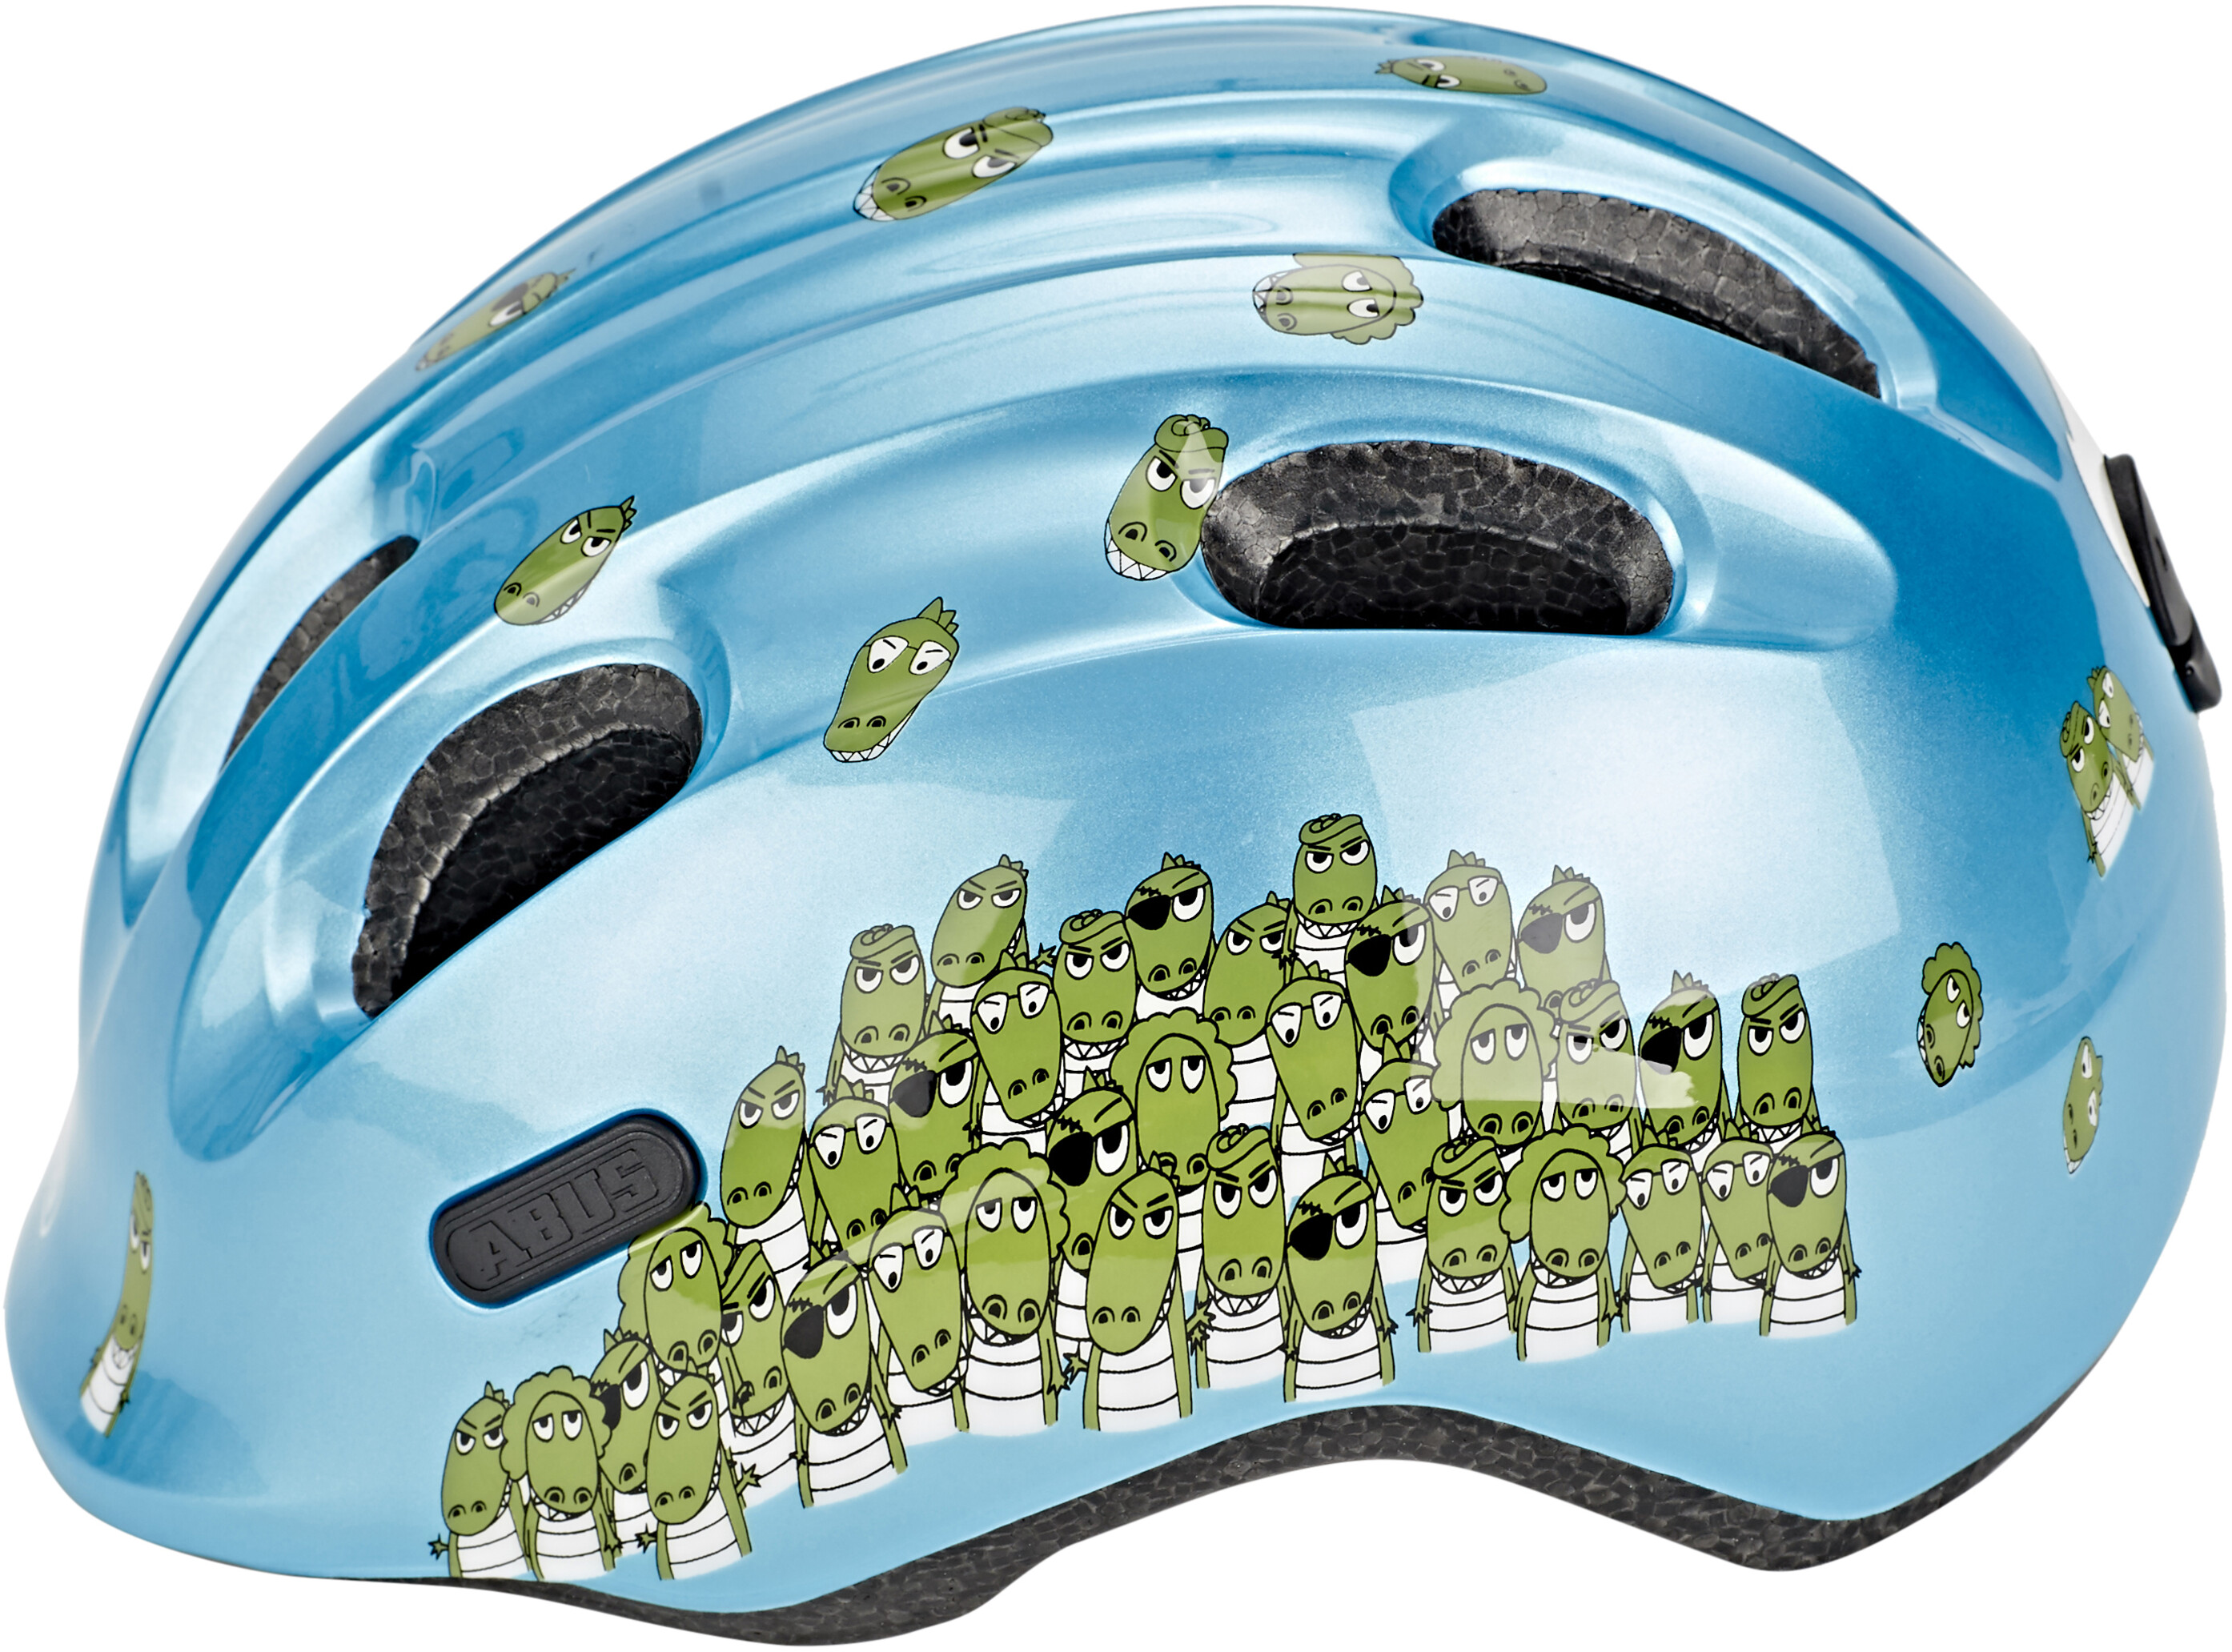 ABUS Smiley 2.0 Cykelhjälm Barn grön turkos - till fenomenalt pris ... 0ae85c023628a